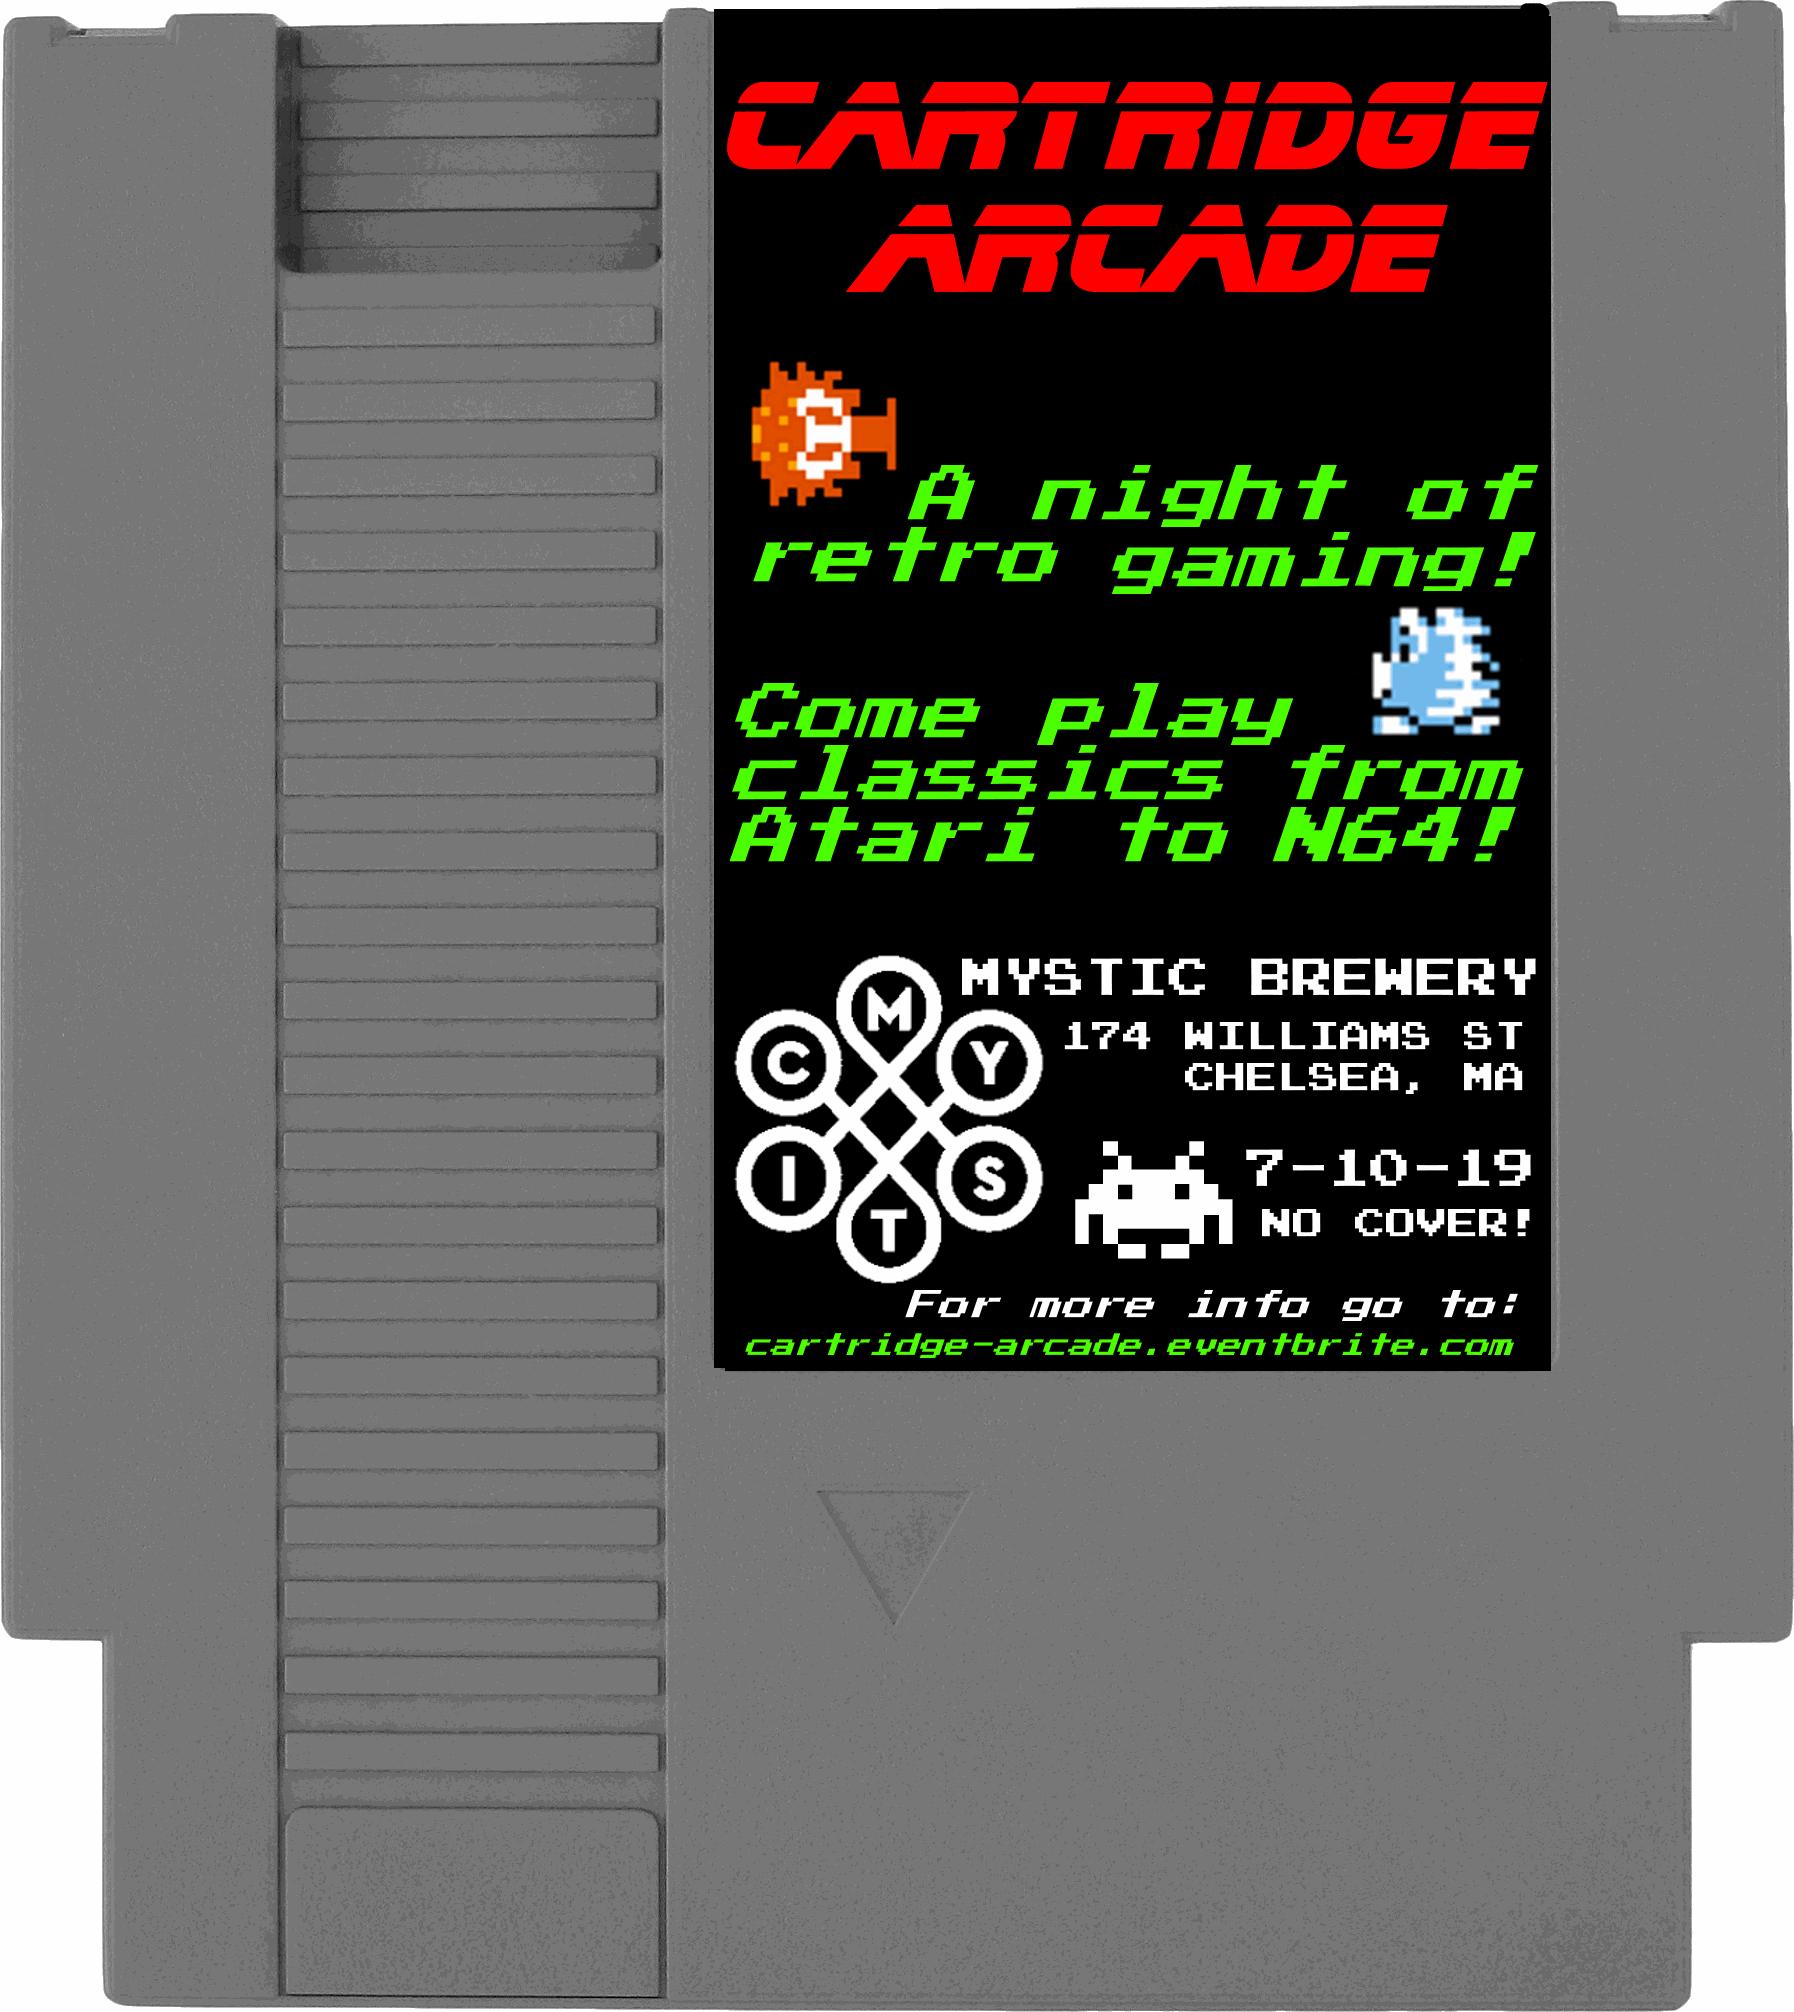 Cartridge Arcade [07/10/19]